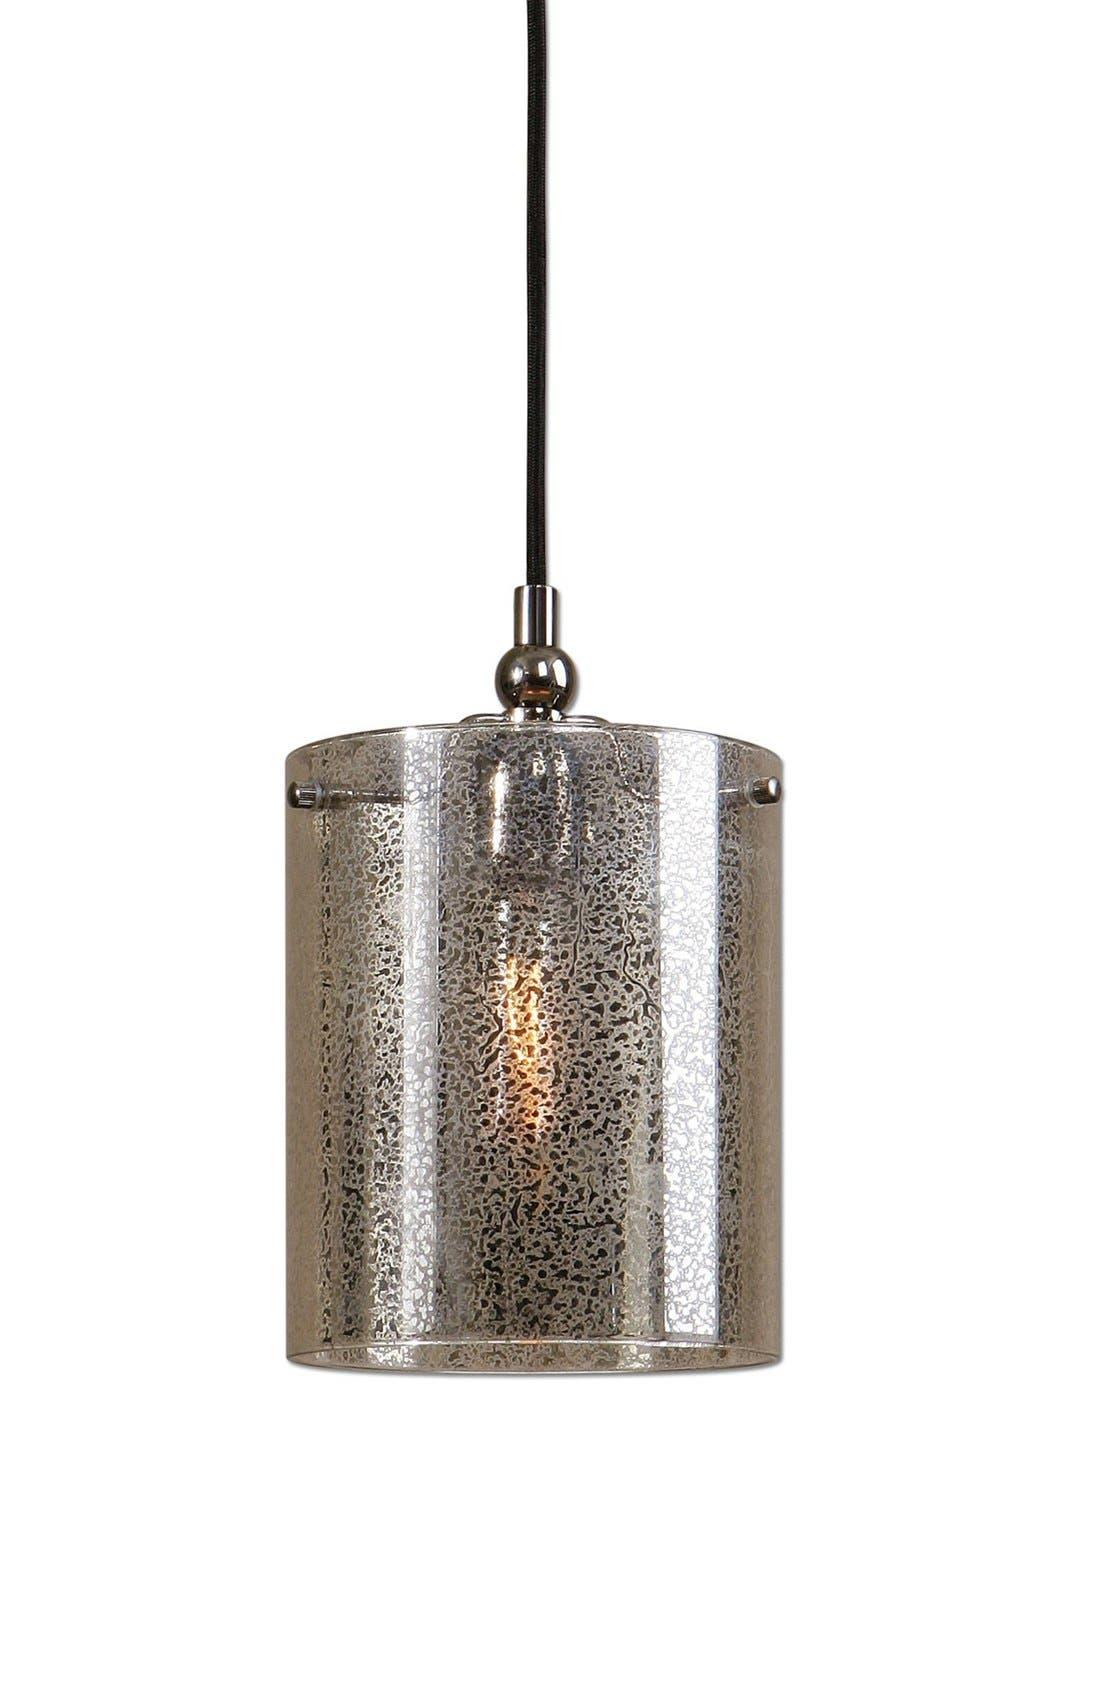 Alternate Image 1 Selected - Uttermost 'Mariano' Mercury Glass Mini Pendant Lamp